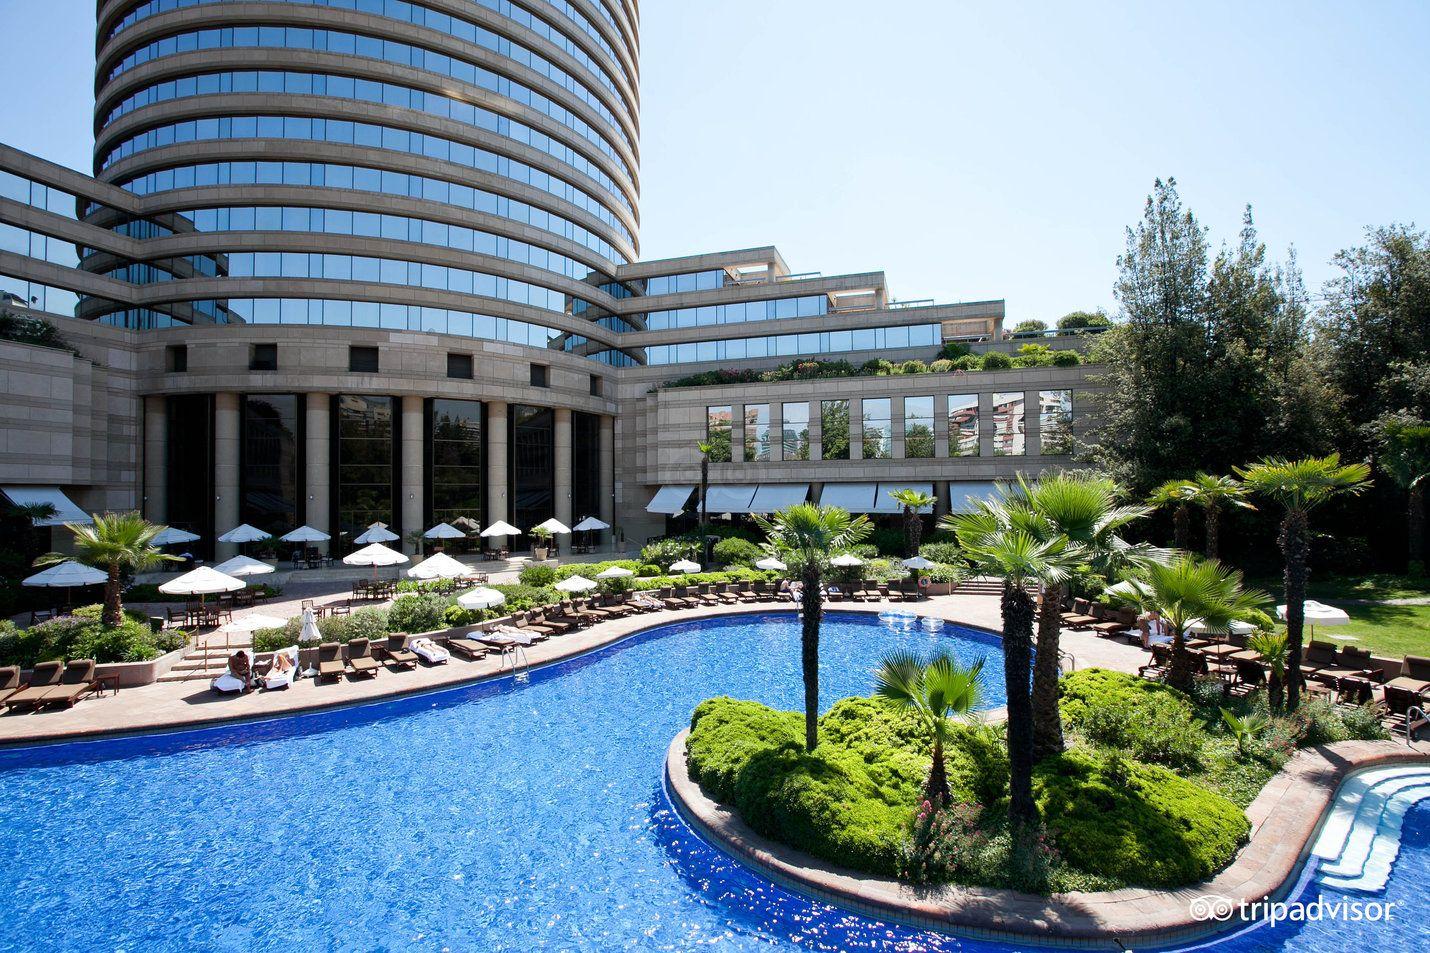 Grand Hyatt Santiago Chile Hotel Reviews Tripadvisor With